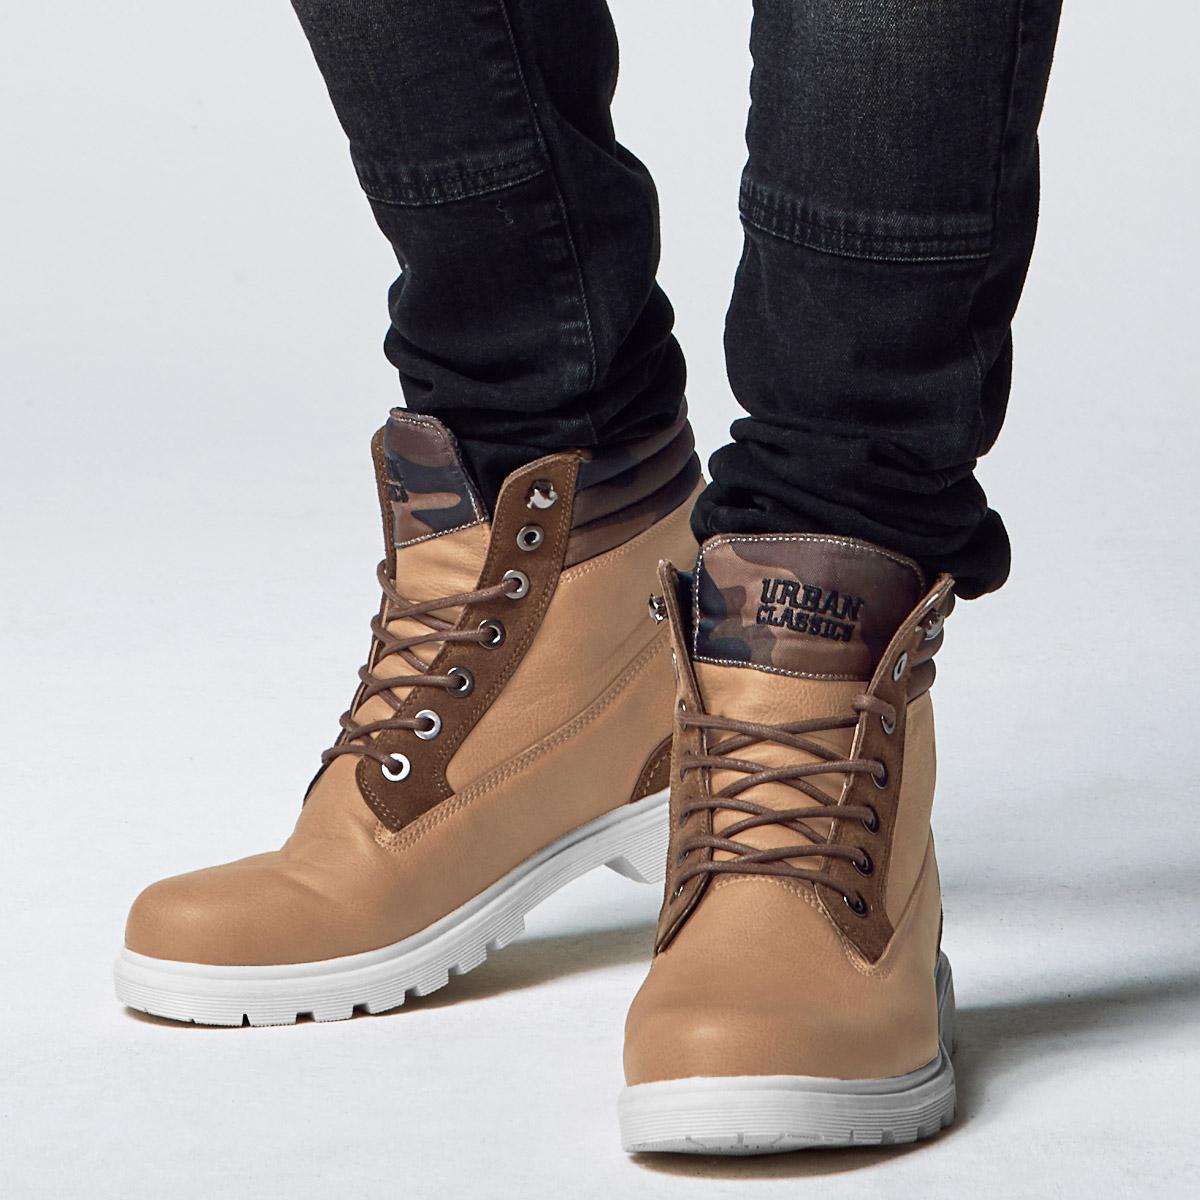 Urban Classics Winter Boots Beige Men's Boots Winter shoes